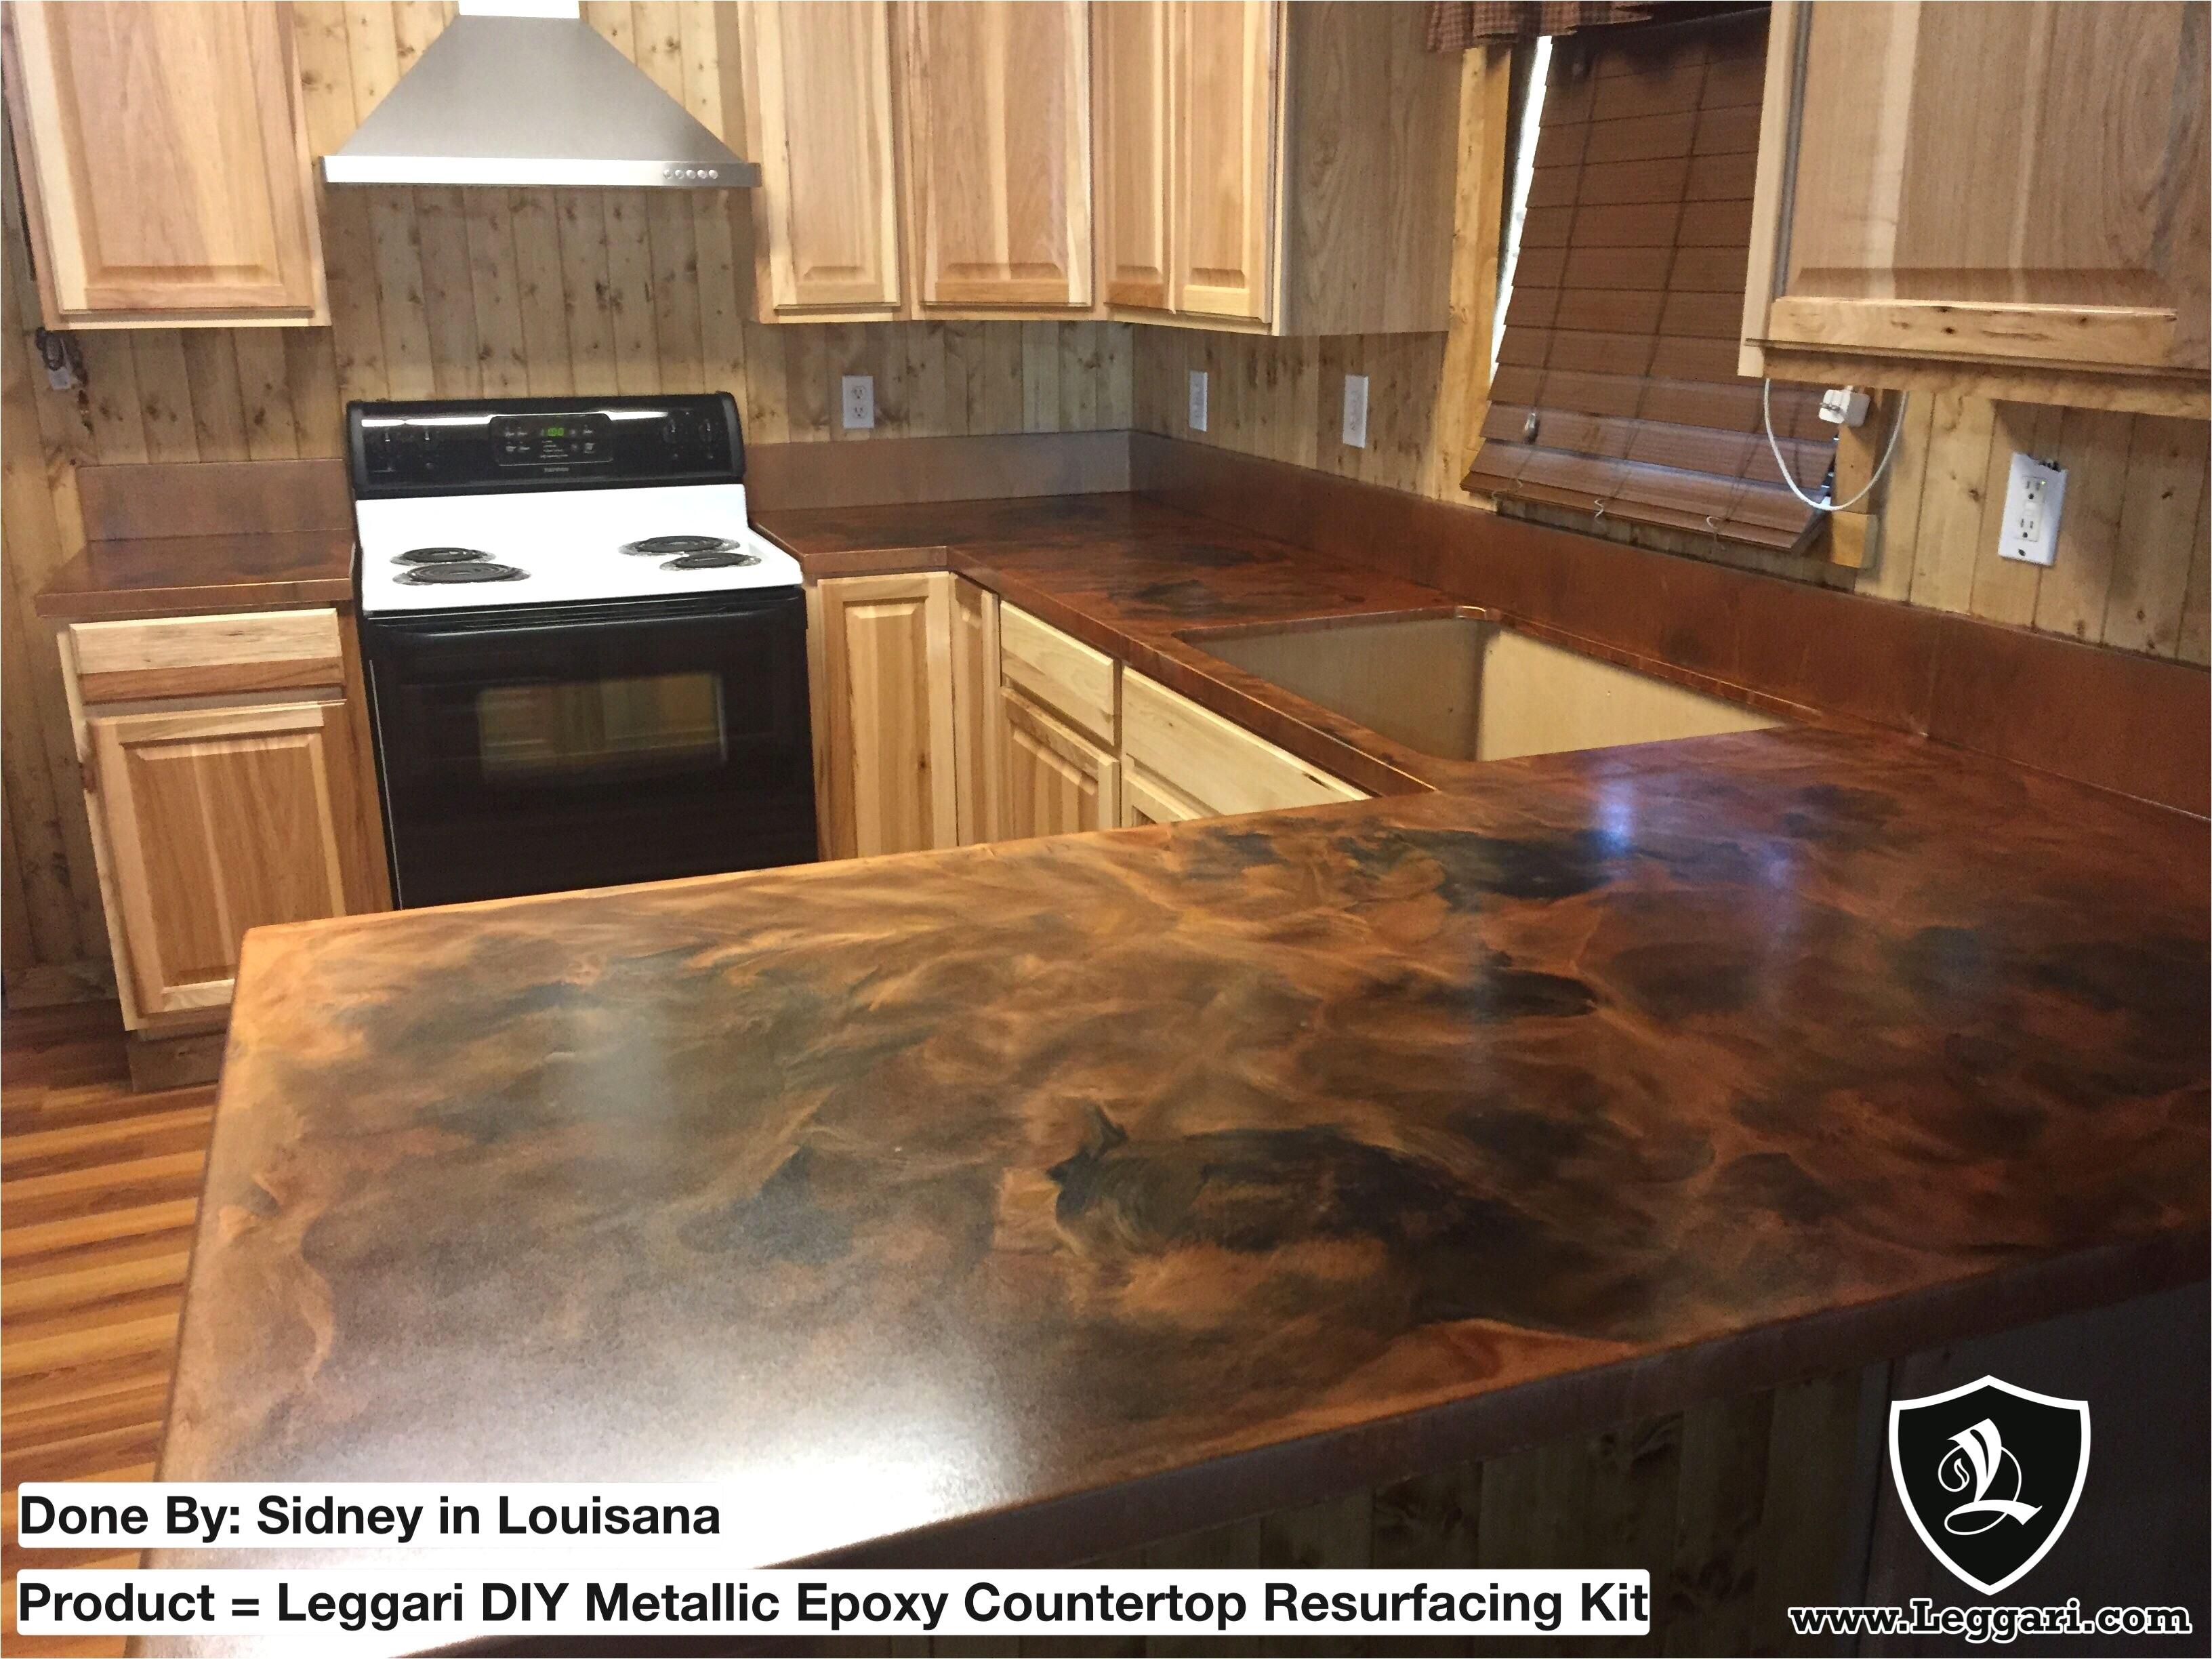 kitchen counter resurface kit beautiful 20 new scheme for kitchen countertops resurfacing kit